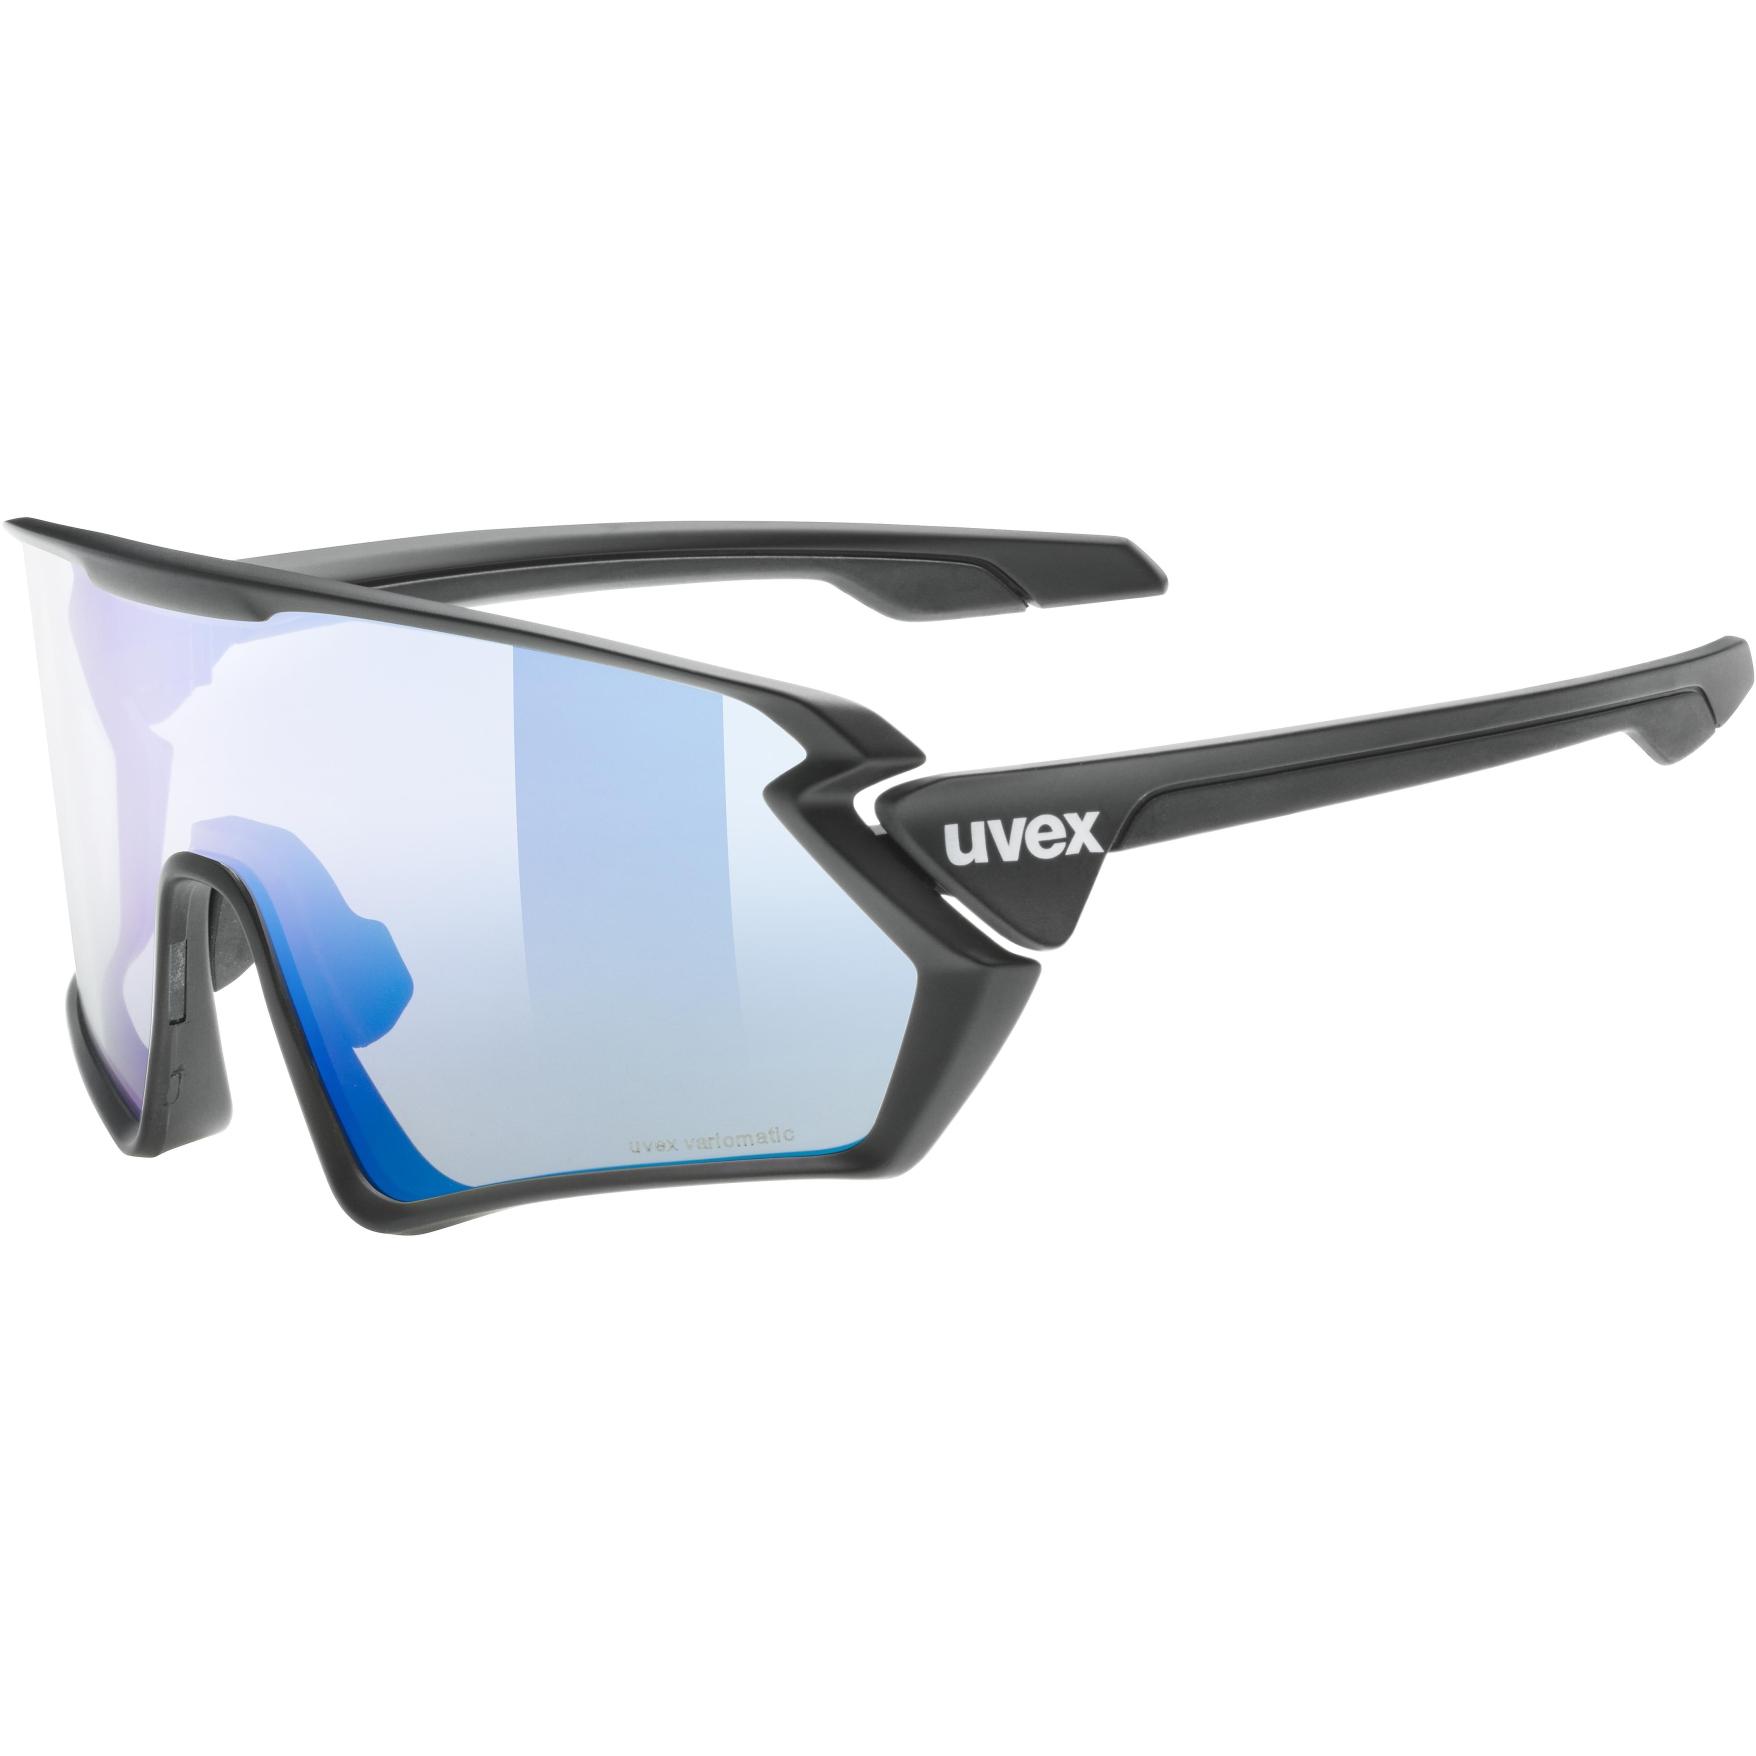 Uvex sportstyle 231 V variomatic Brille - black mat/variomatic litemirror blue + clear